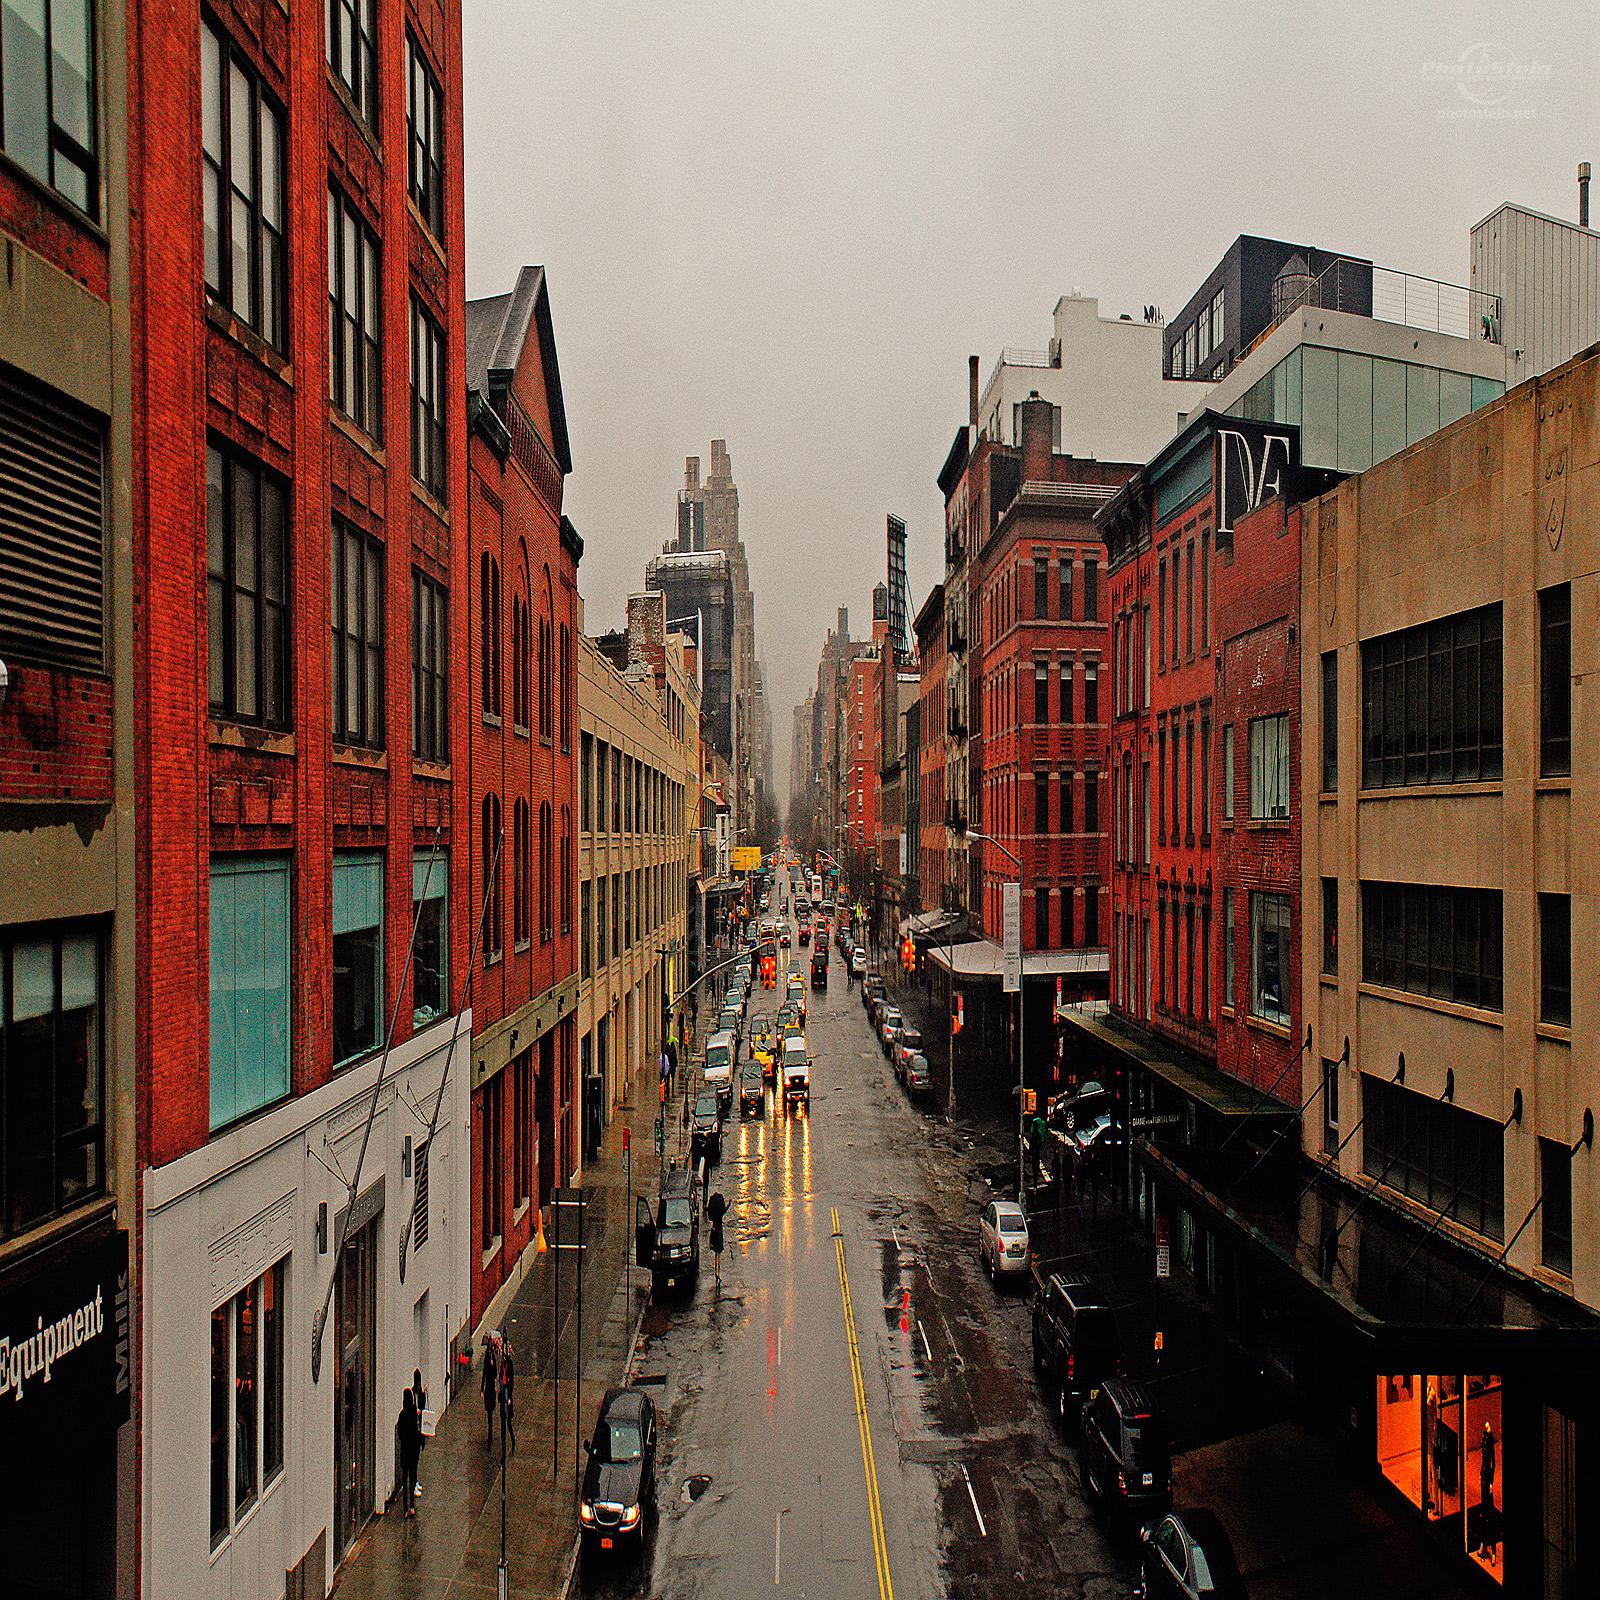 ManhattanStreetFromHighLane_1600